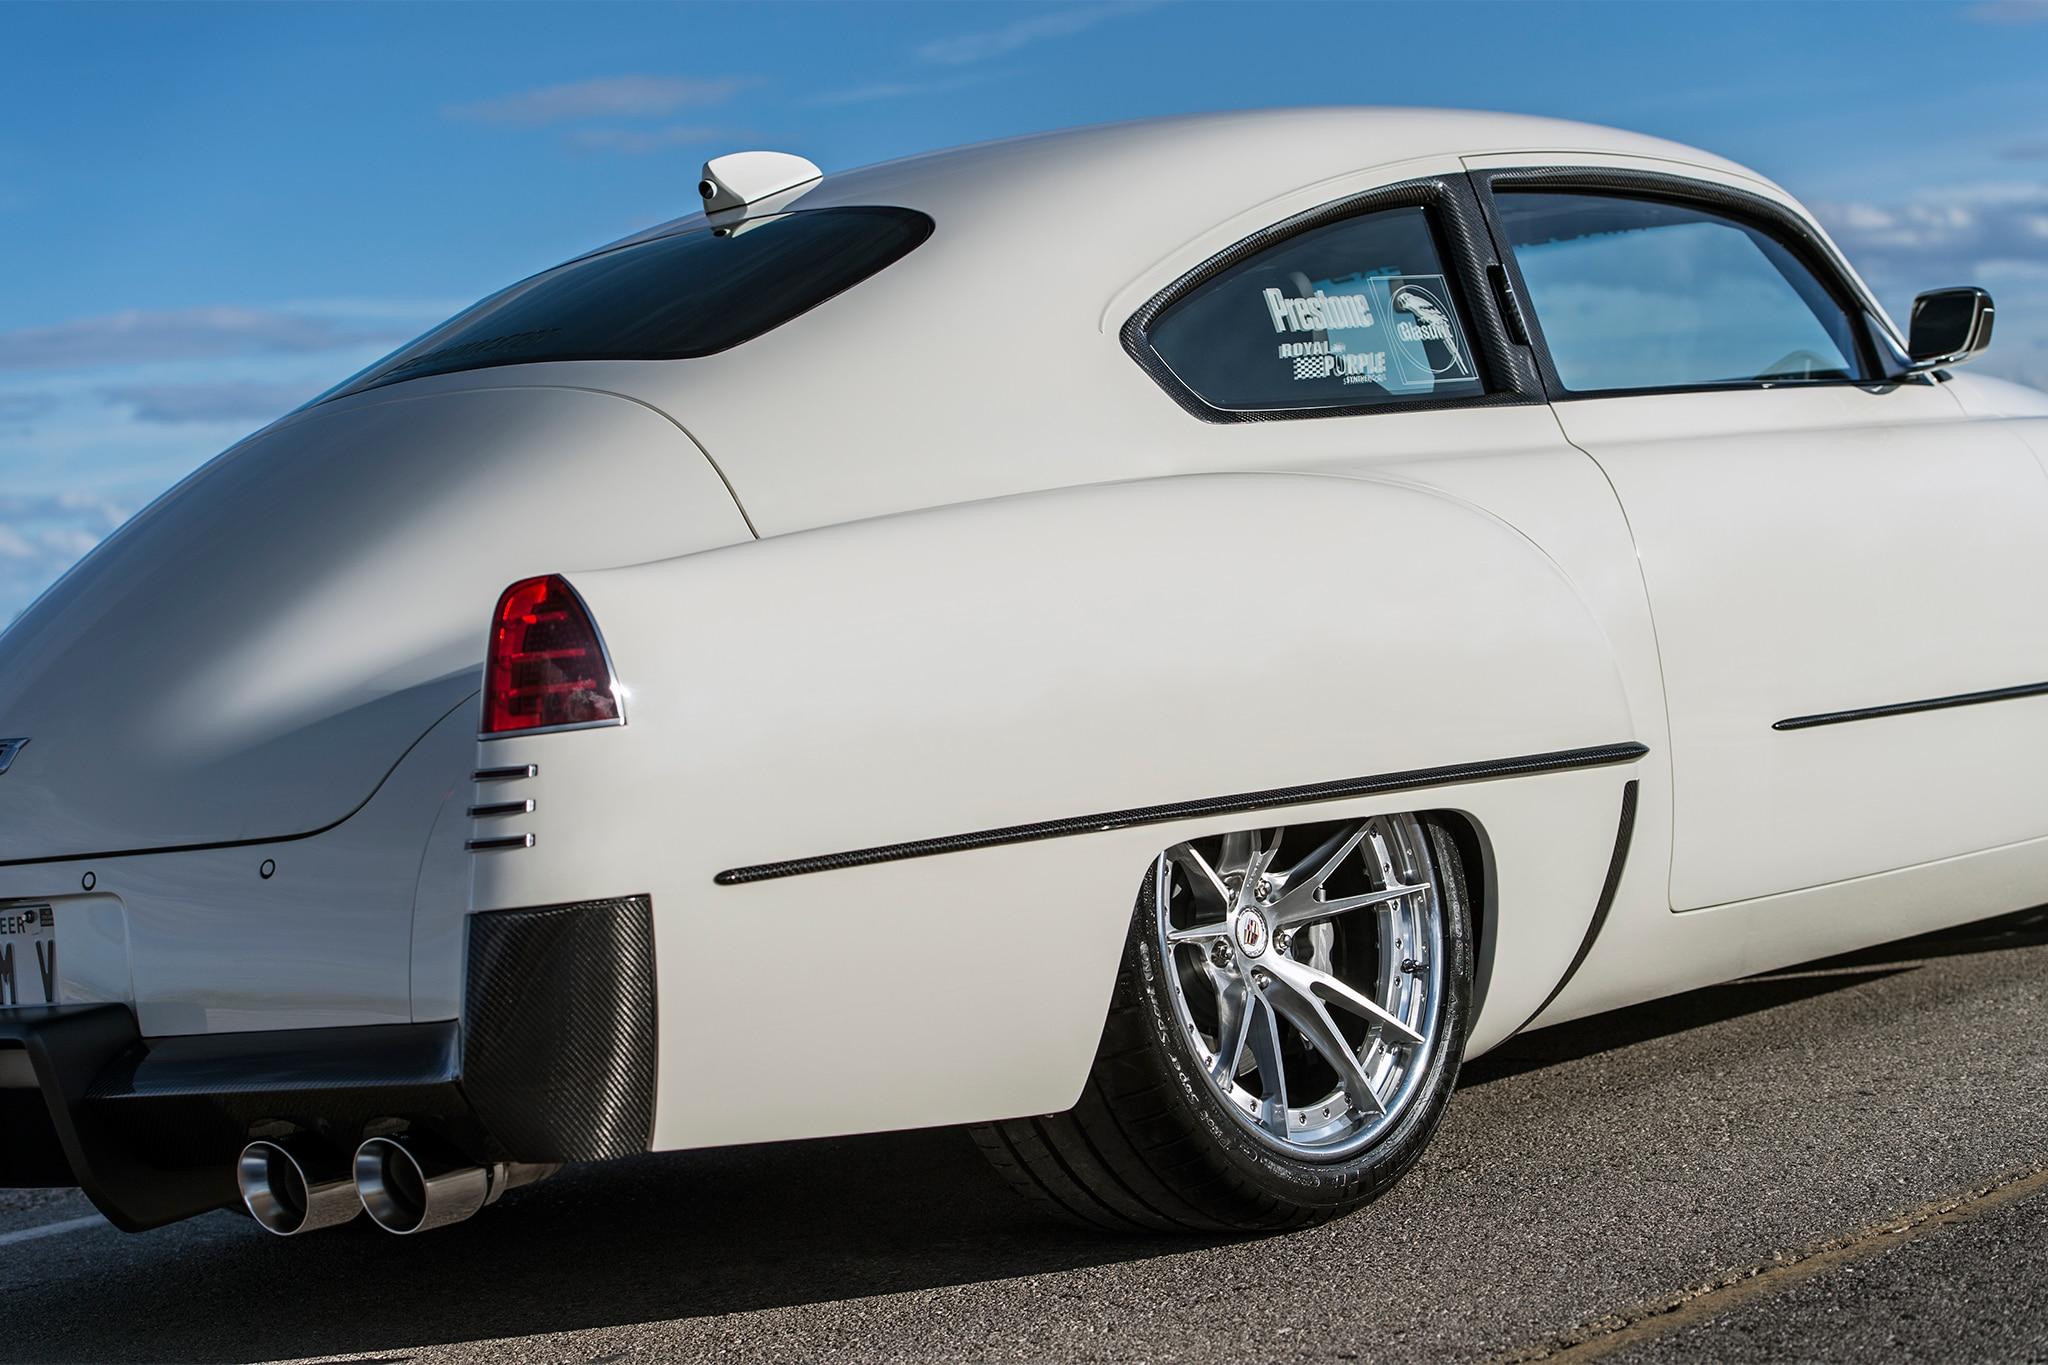 SEMA 2016: Ringbrothers' Custom 1948 Cadillac | Automobile Magazine